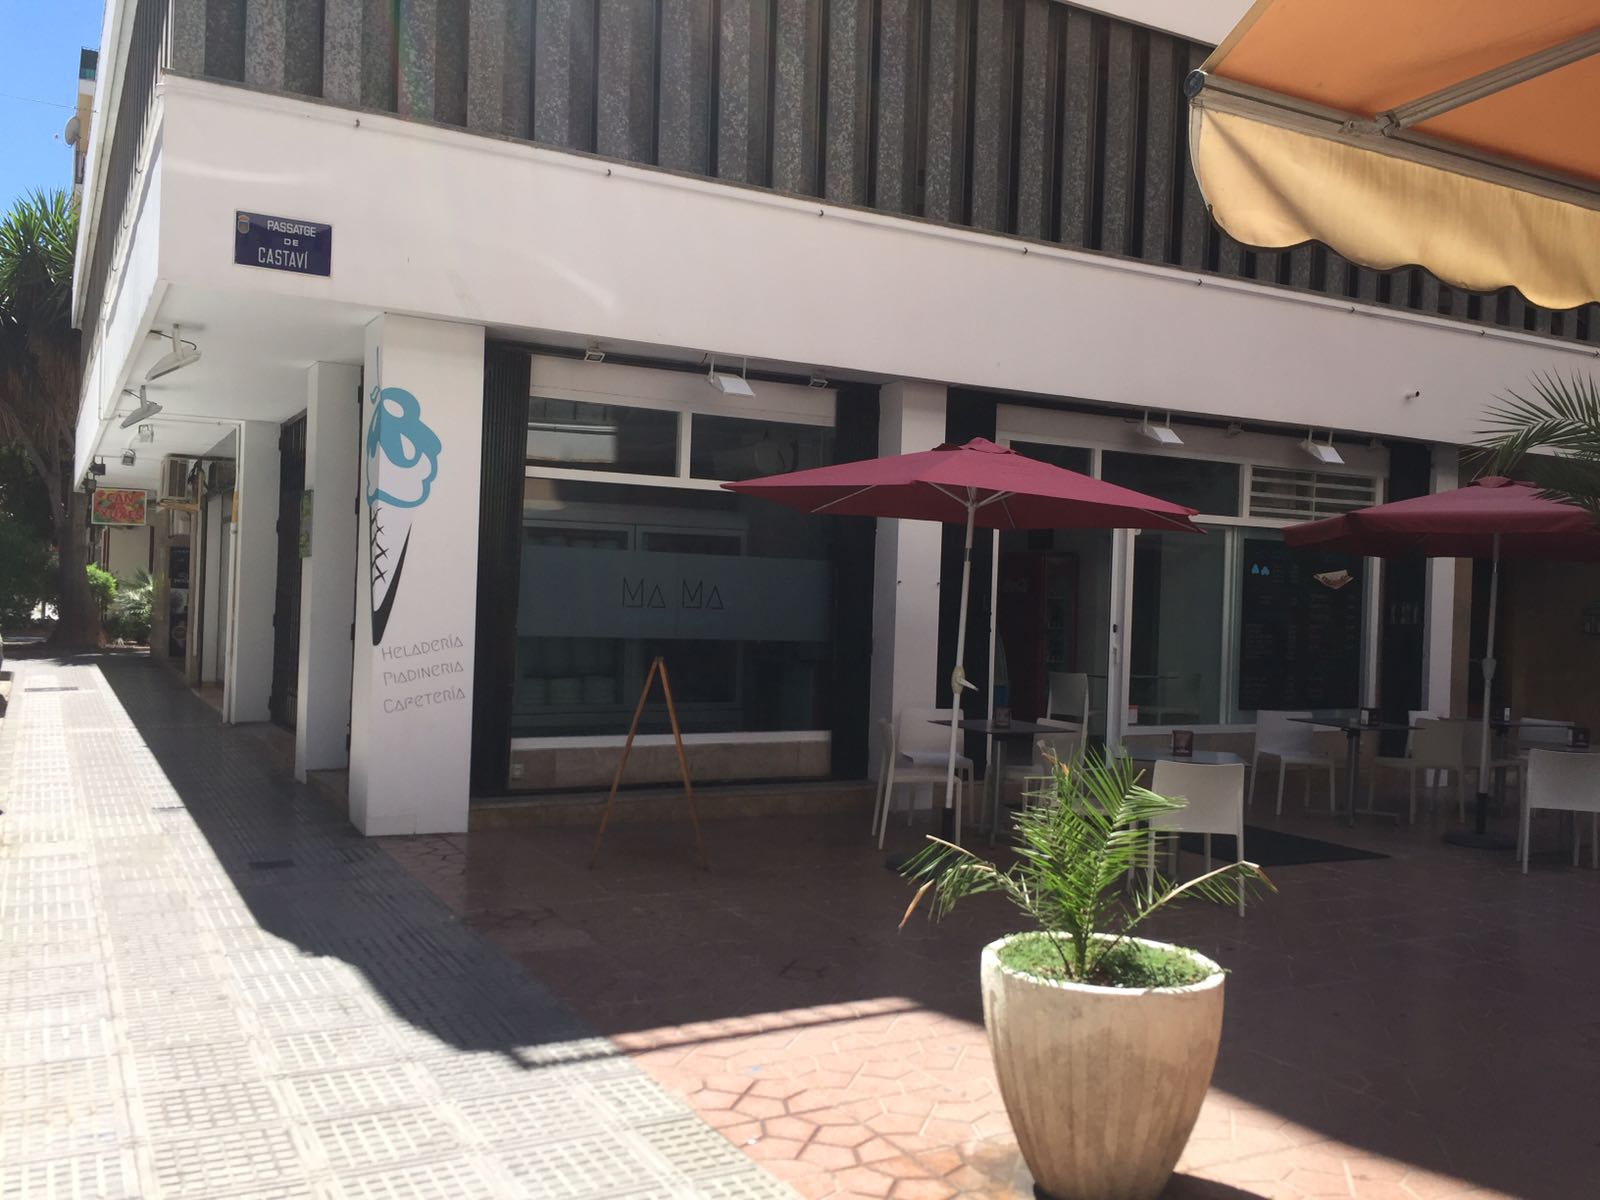 Traspaso of an Ice Cream Shop in the Centre of Ibiza